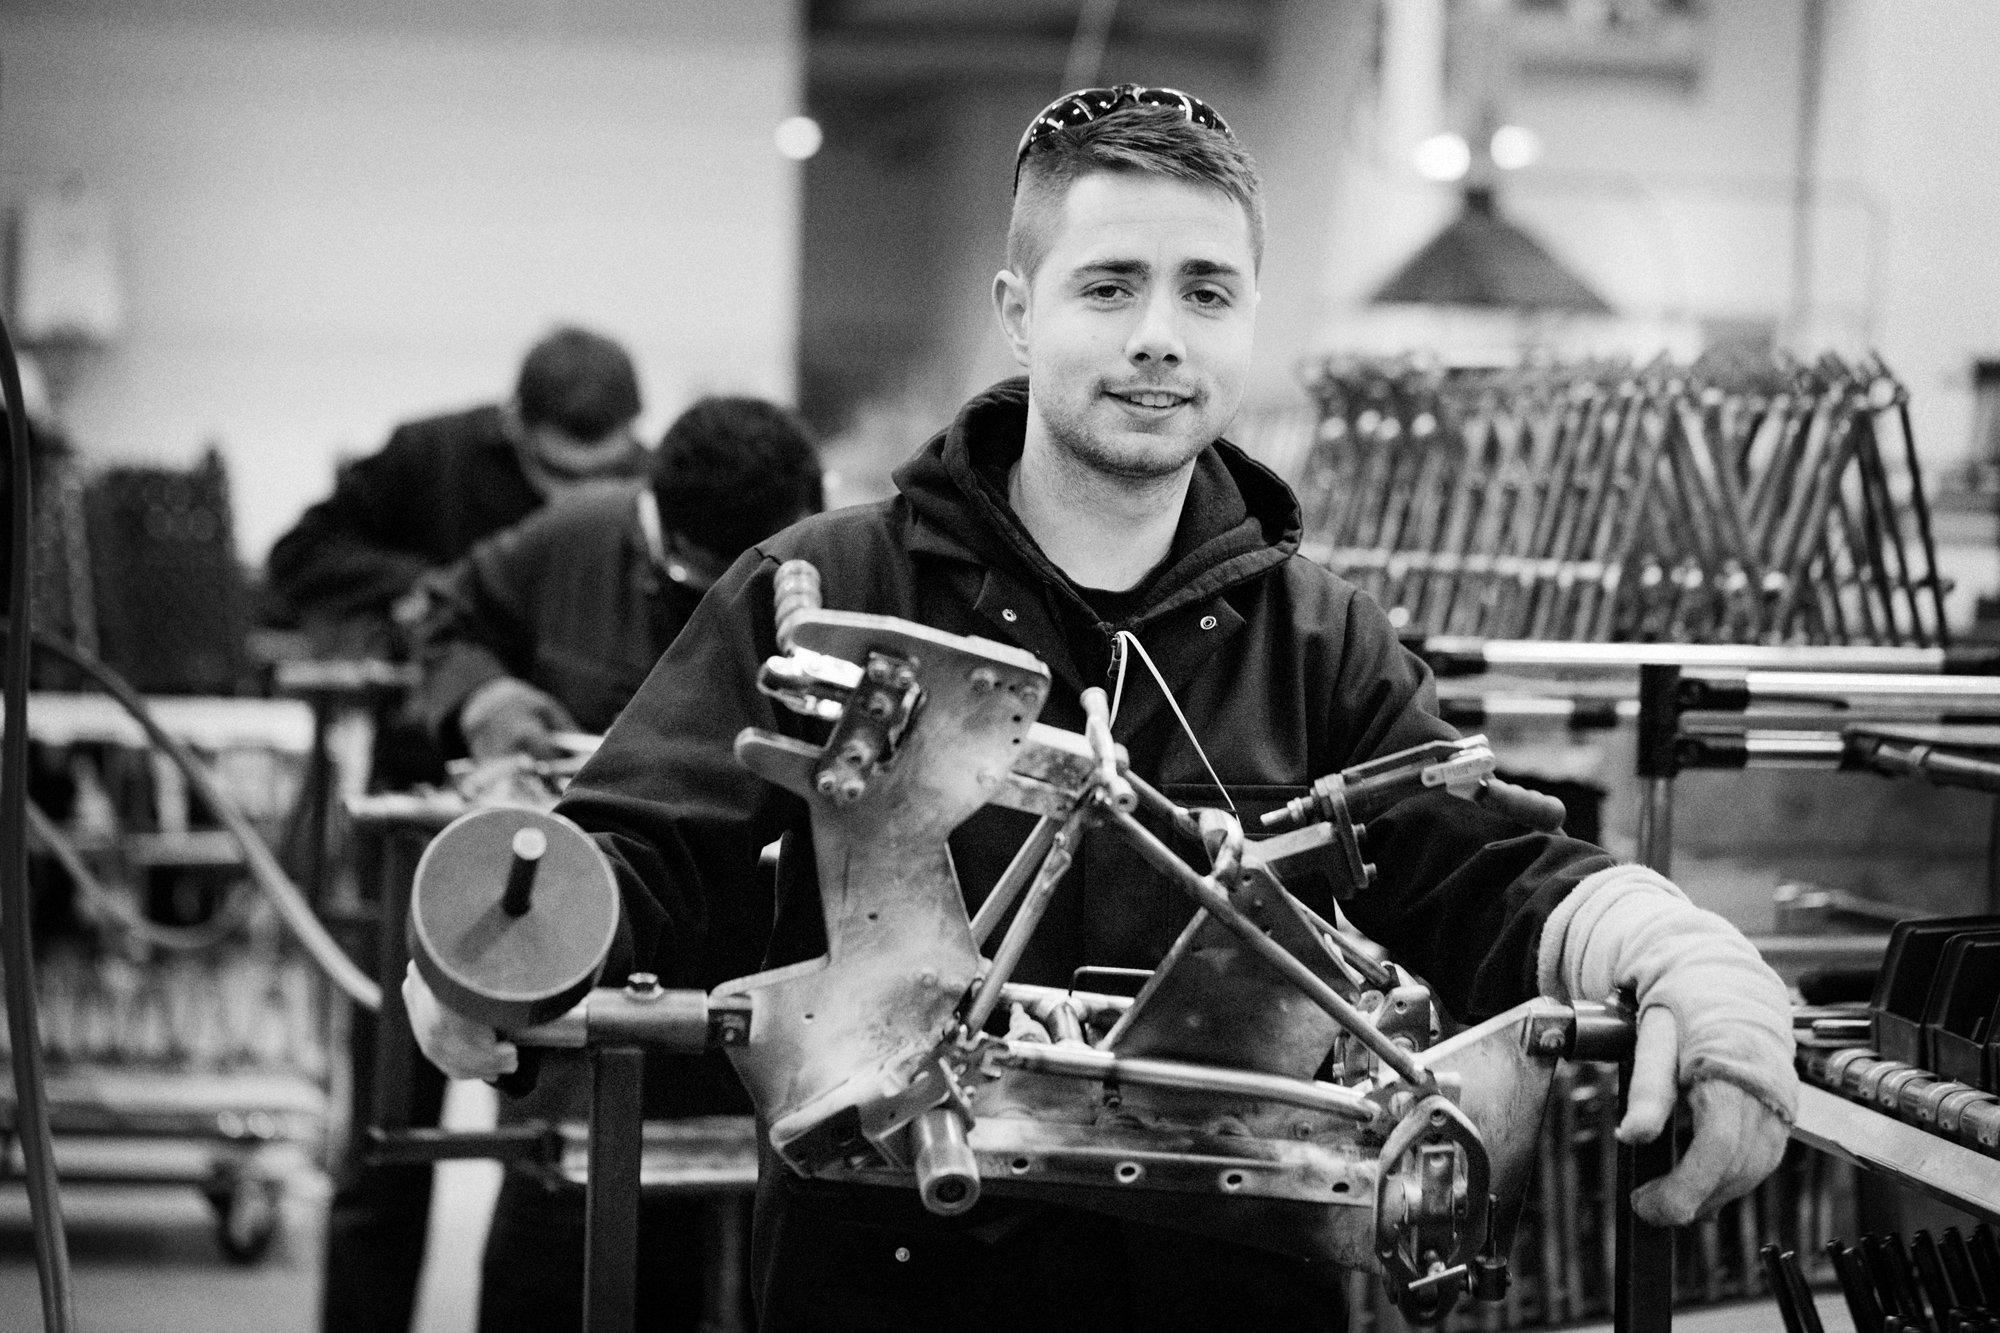 Brompton cycle, folding bike, Brompton Bicycle, manufacturing, british made bikes, bikes, cycling, brazing, Brompton